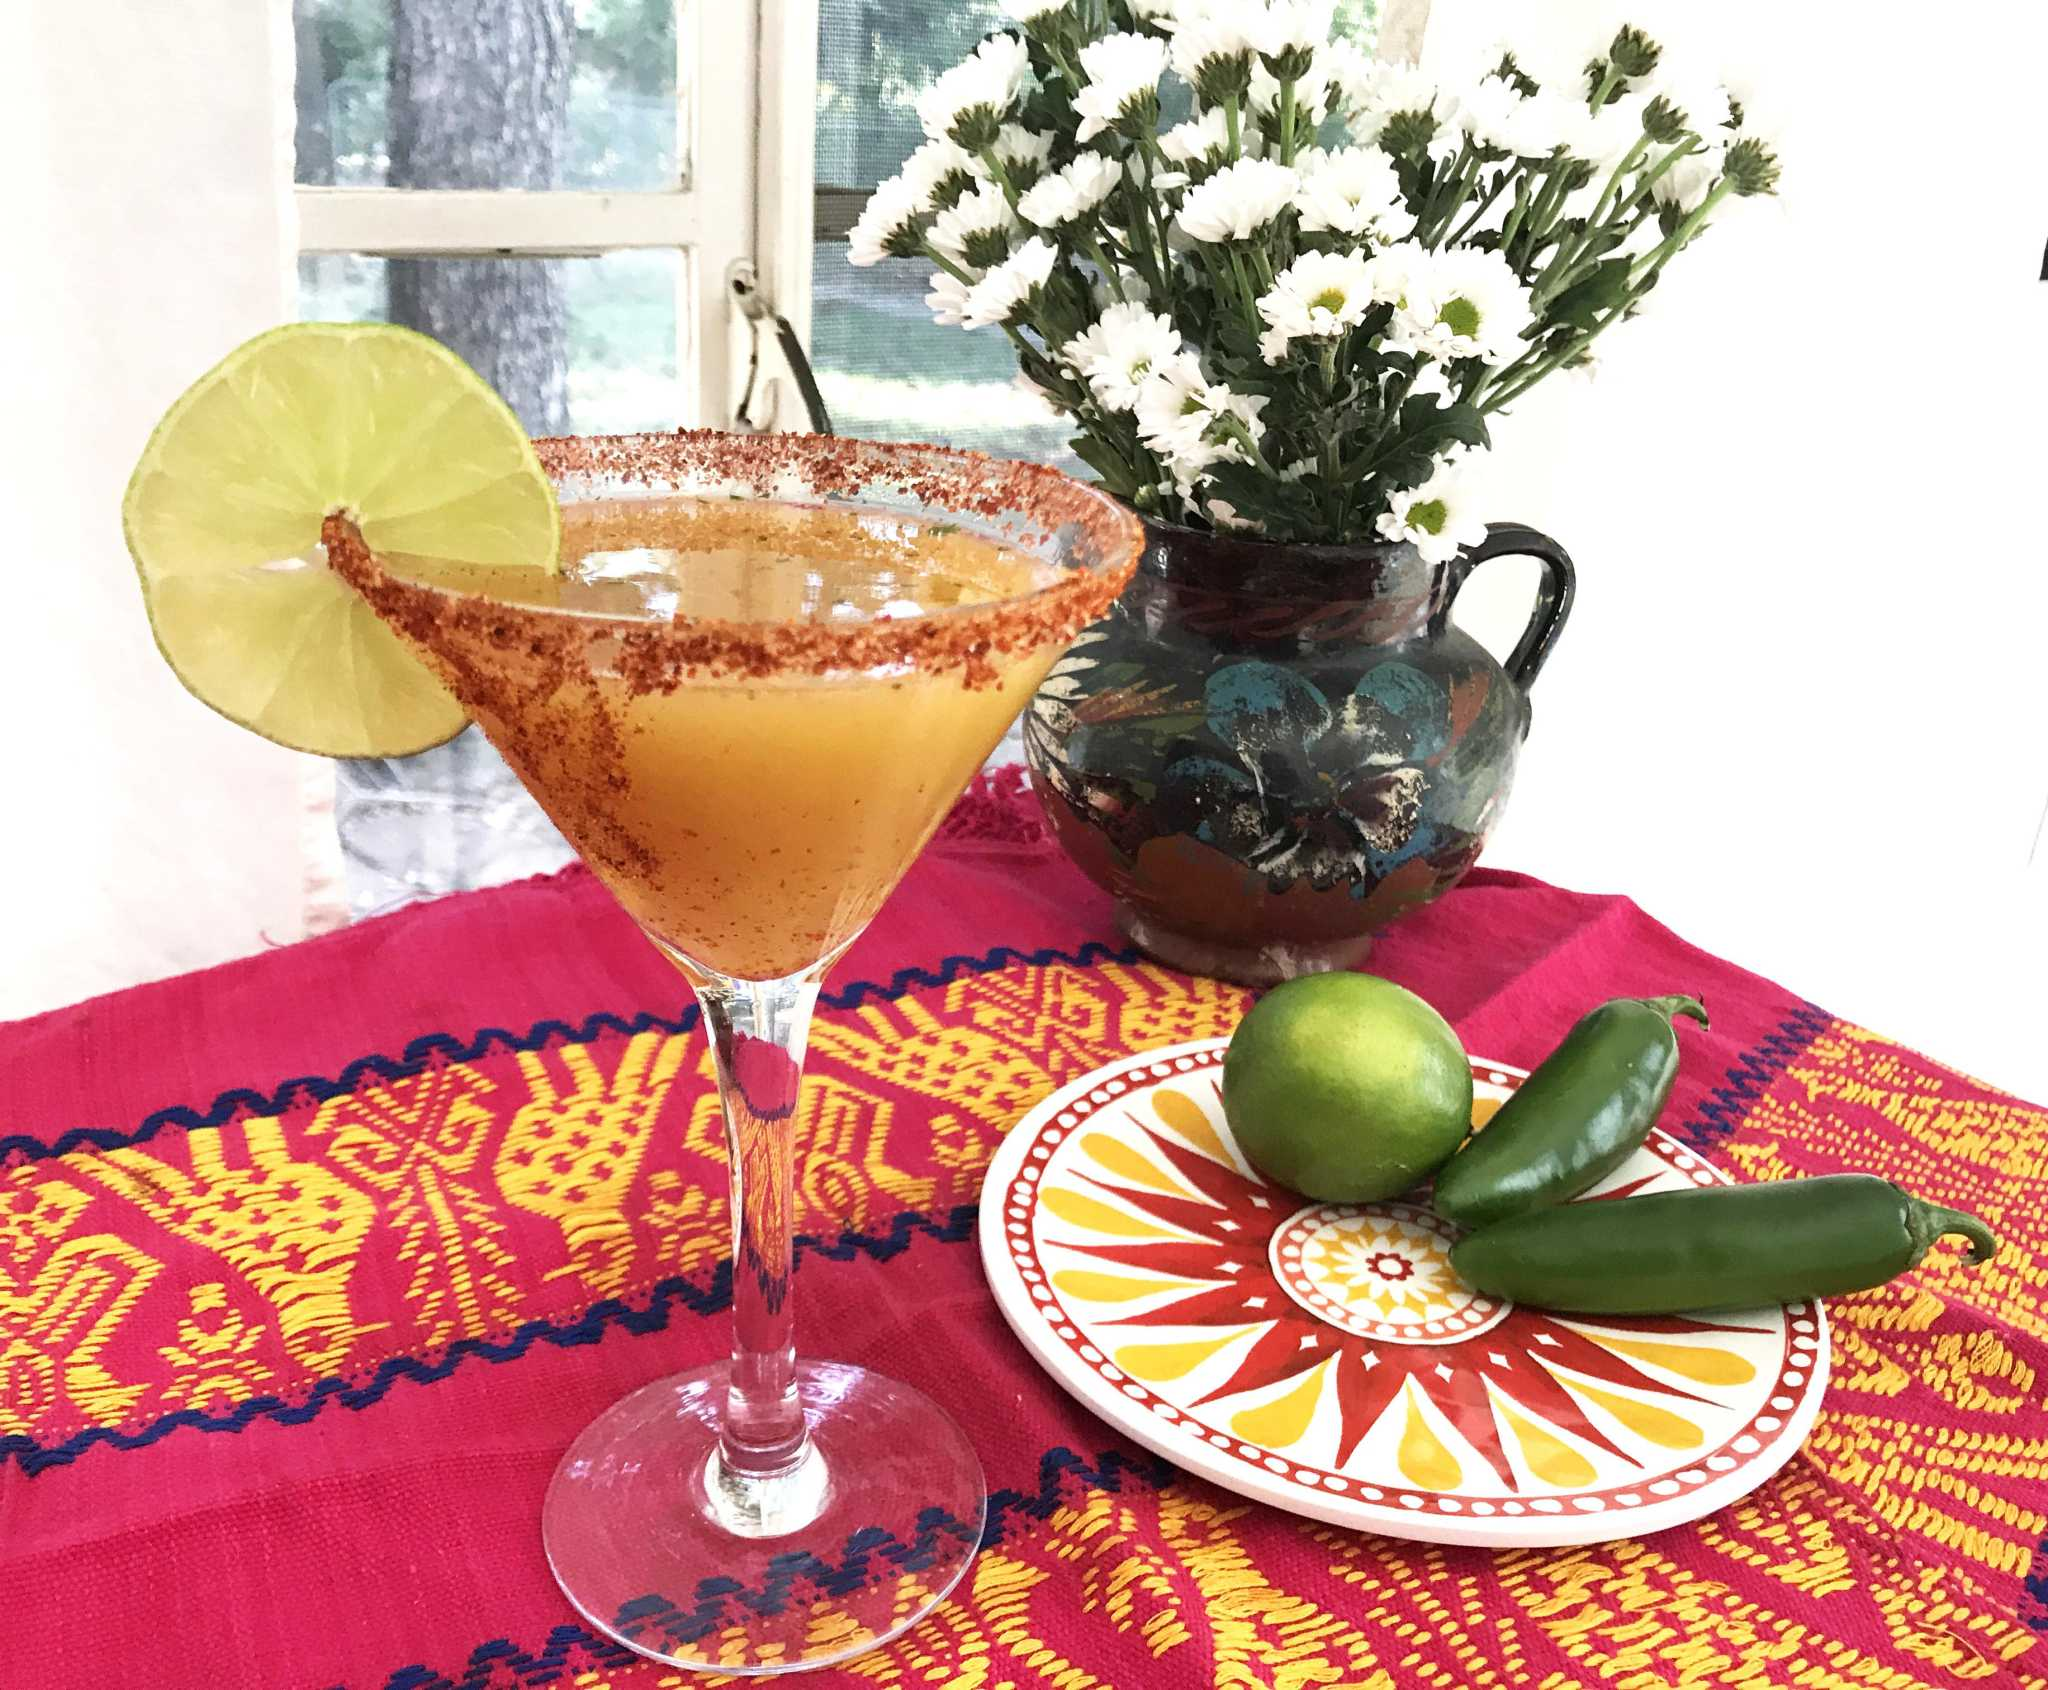 Pineapple, tequila, jalapeño make for great alt-margaritas, 2 recipes